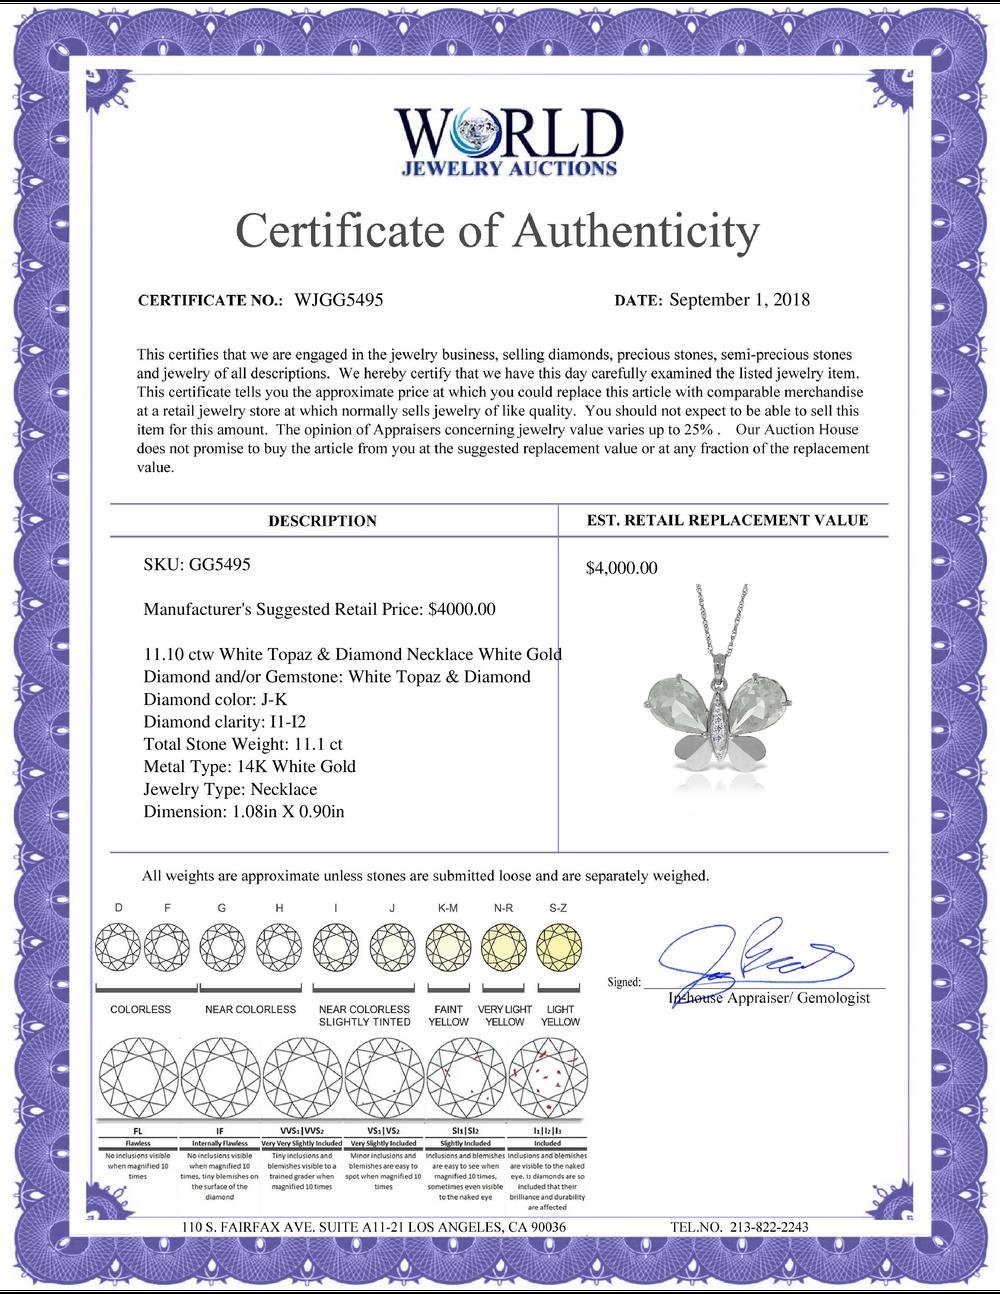 Lot 4179: Genuine 11.10 ctw White Topaz & Diamond Necklace Jewelry 14KT White Gold - REF-130N2R